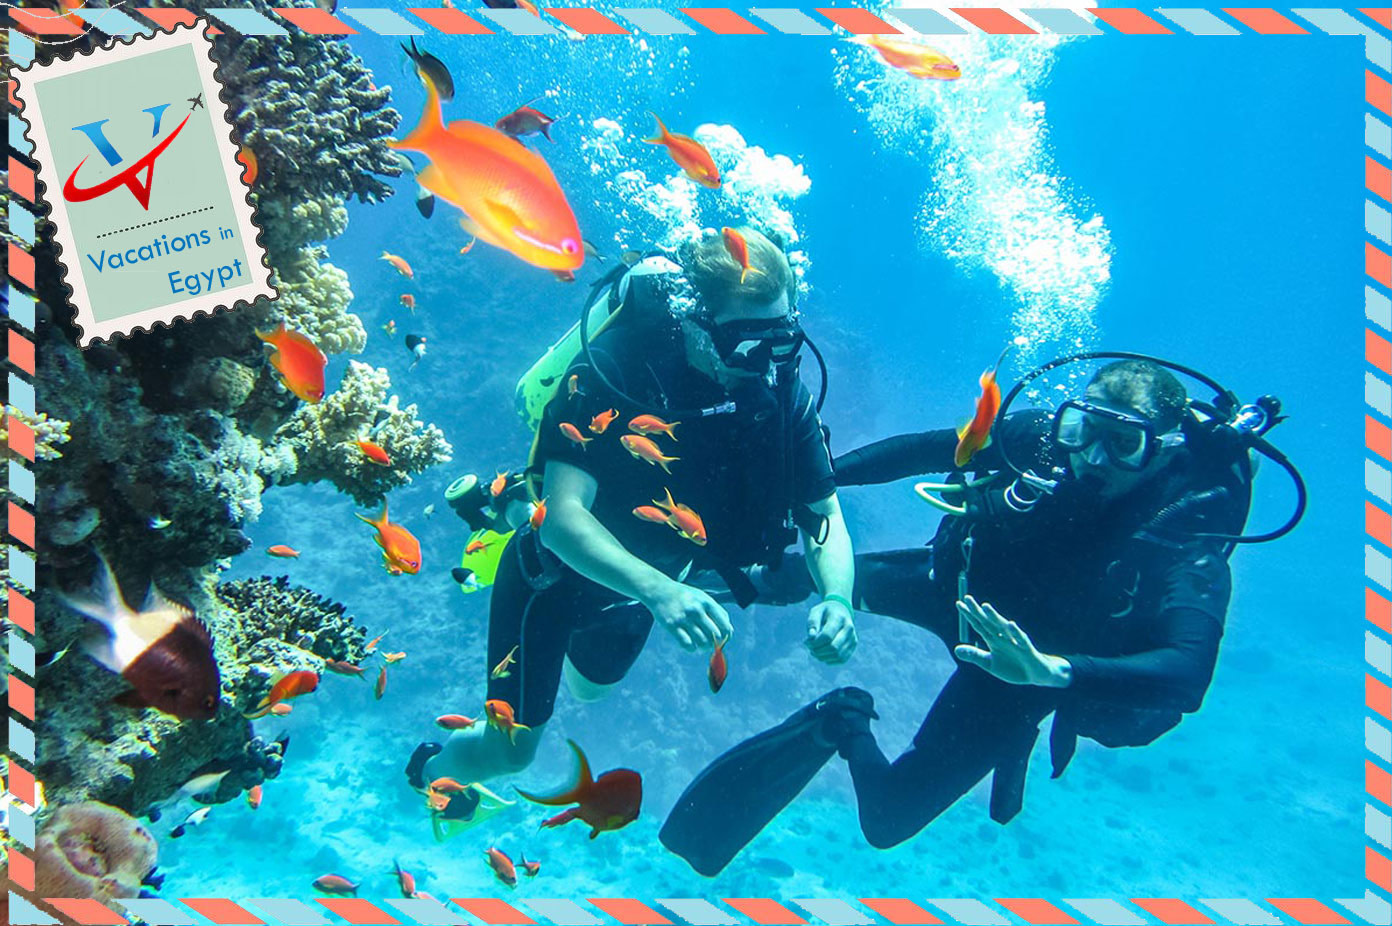 sharm el sheikh diving holidays